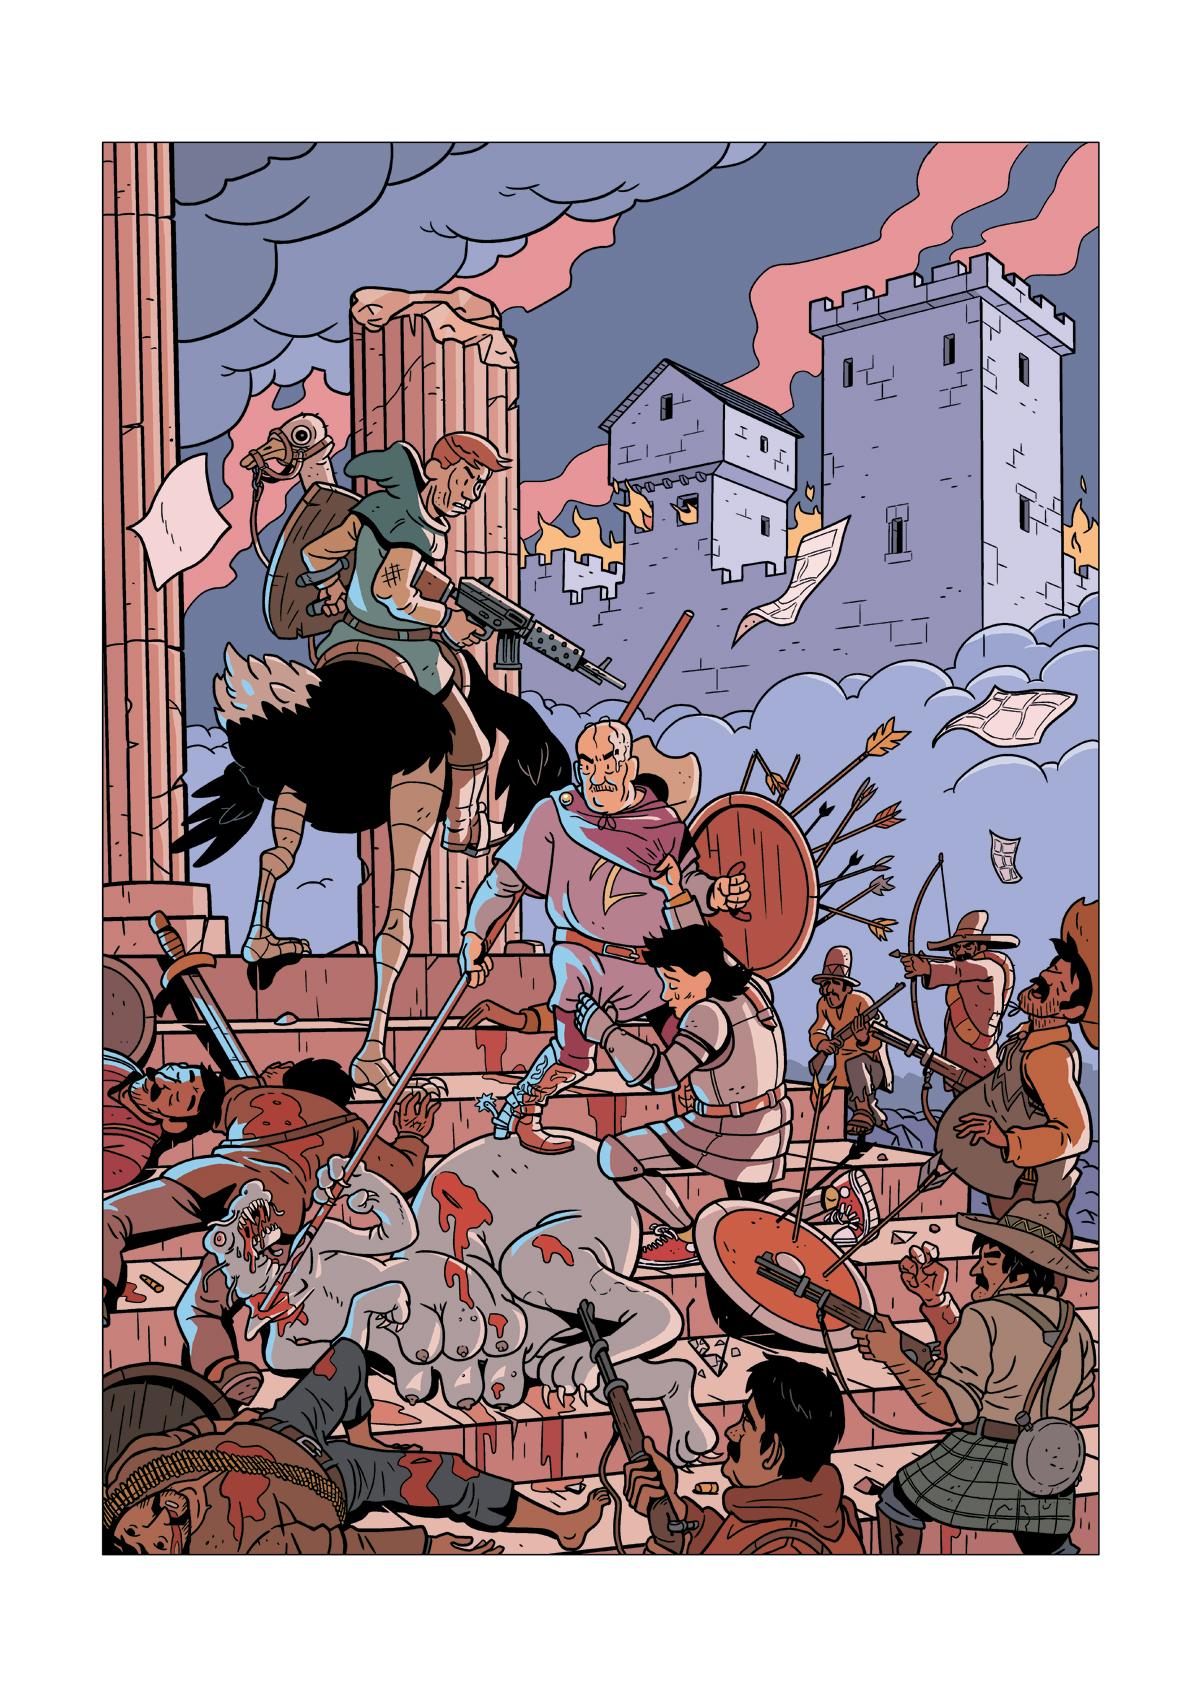 Gilbert Pinos terrassant le dragon, affiche d'Aurélien Maury